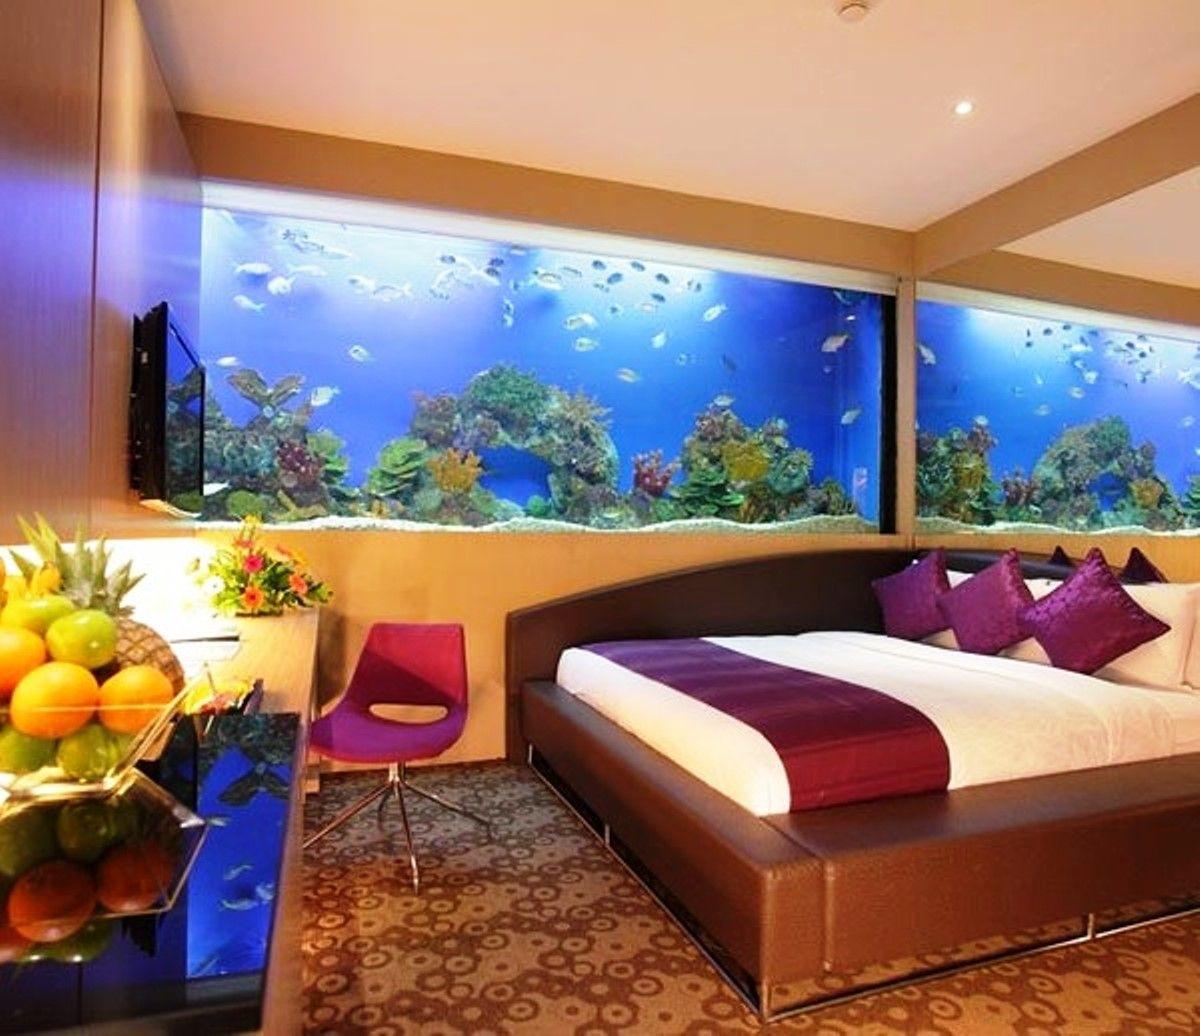 Aquarium Decor Ideas Bedroom - Real House Design